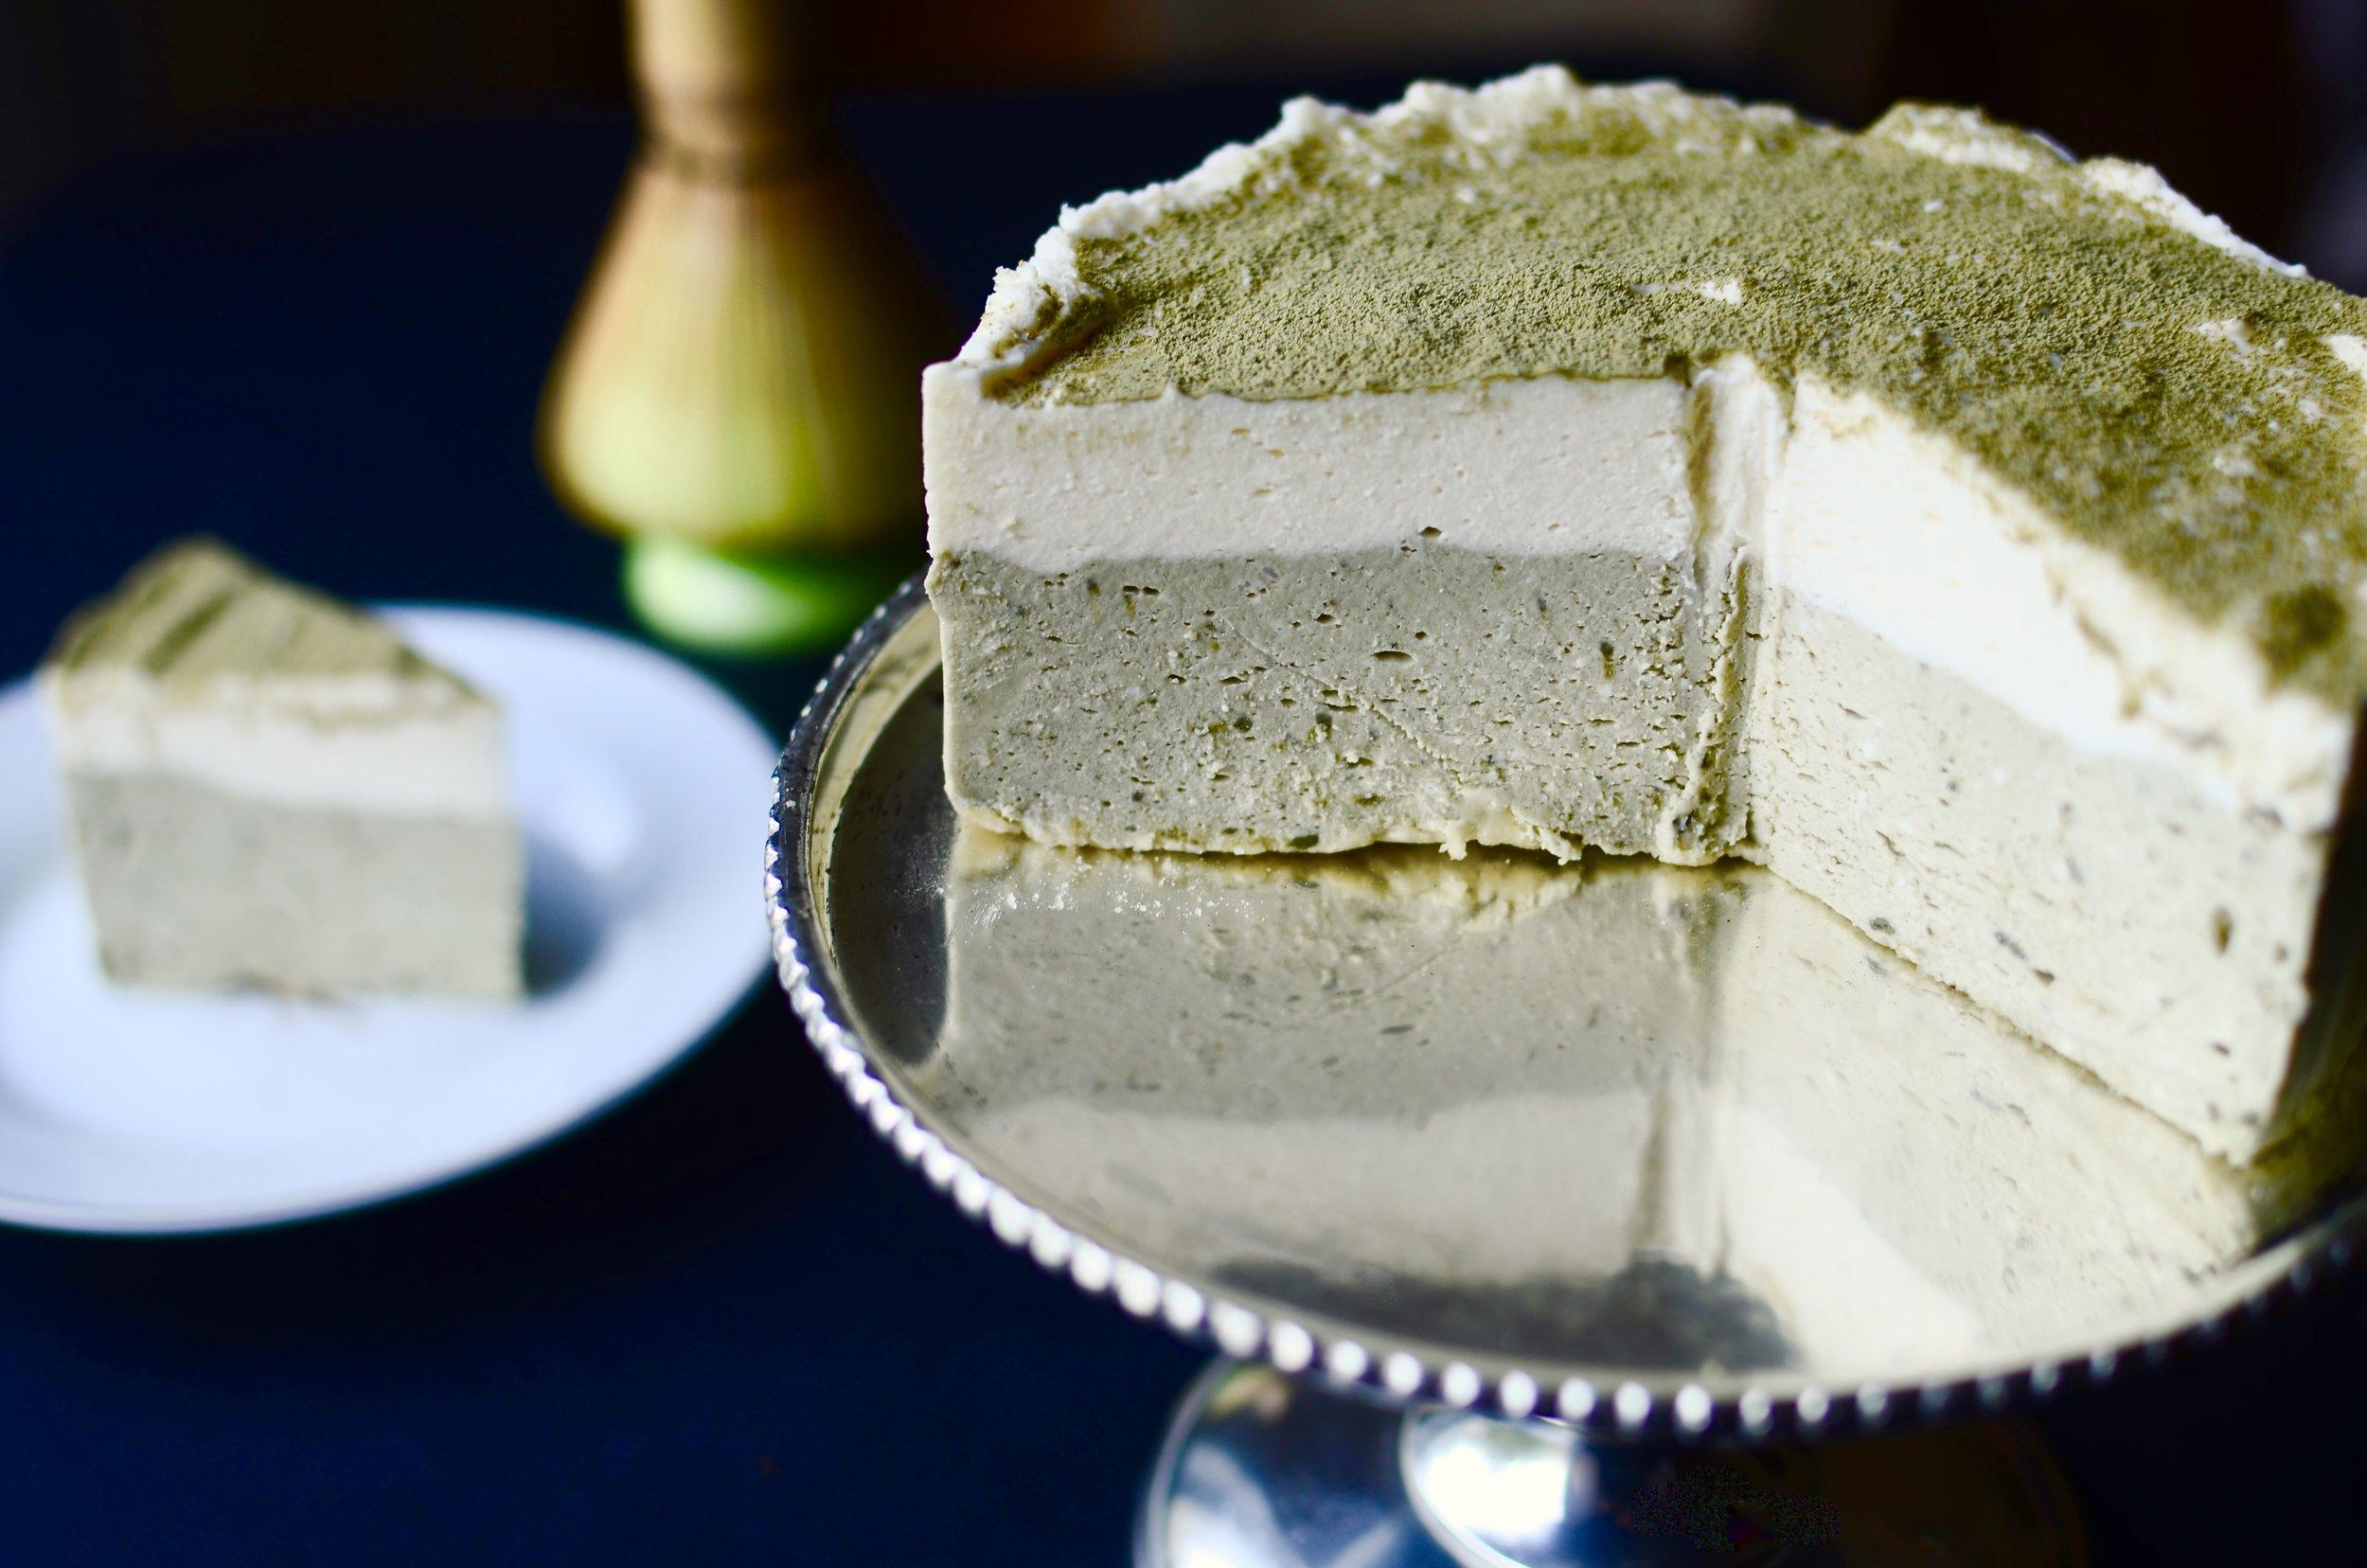 ButterYum - Japanese No-Bake Matcha Cheesecake. matcha cheesecake recipe. no bake matcha dessert recipe. how to make matcha dessert.